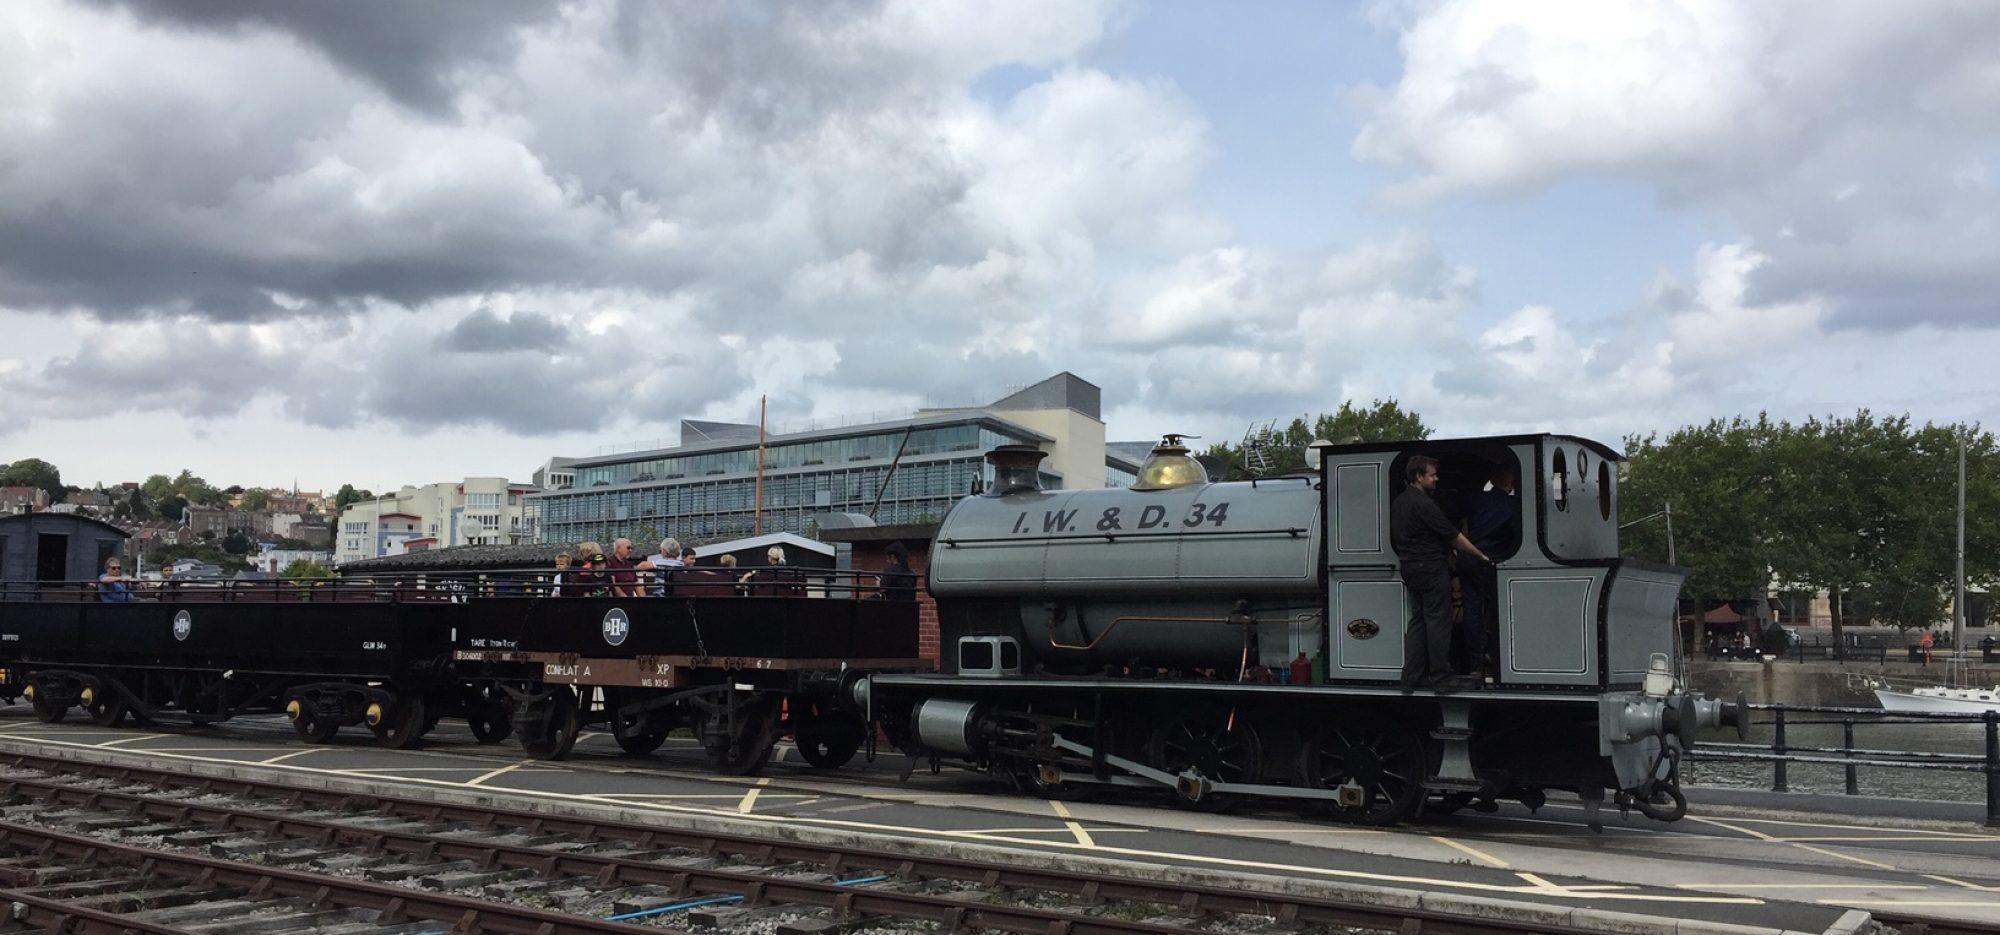 Association of British Transport & Engineering Museums